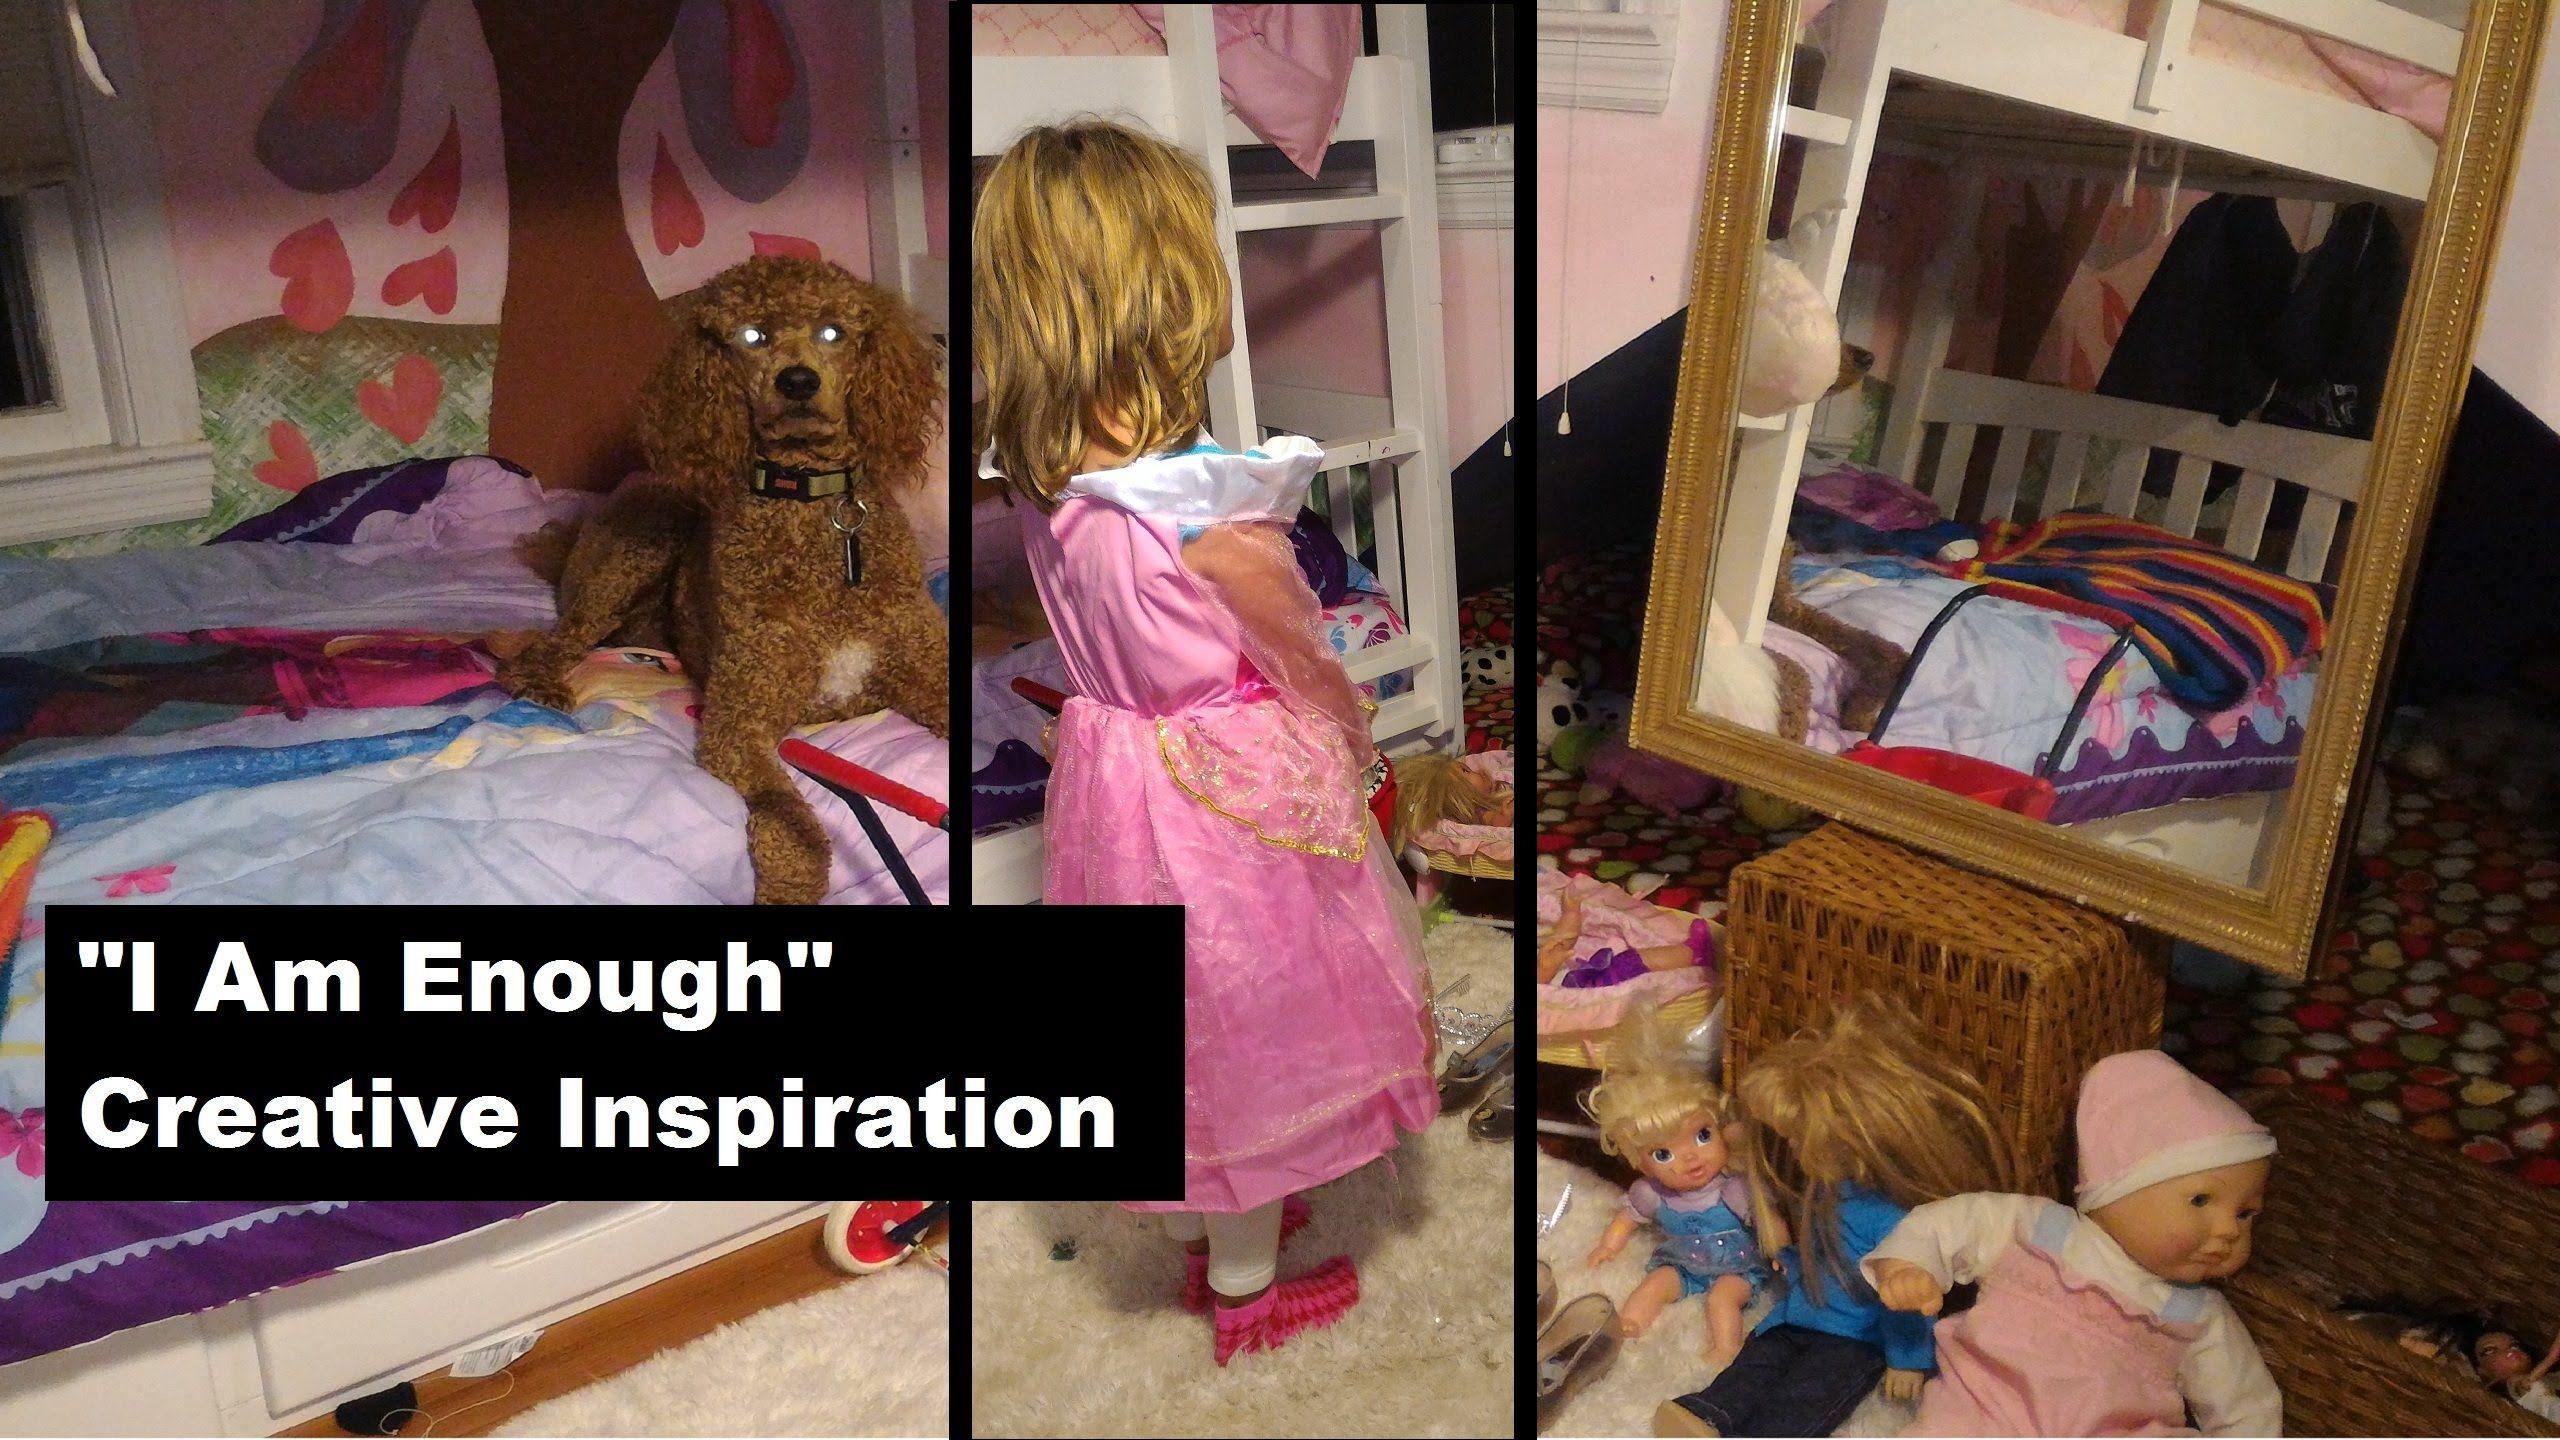 I Am Enough Creative Inspiration